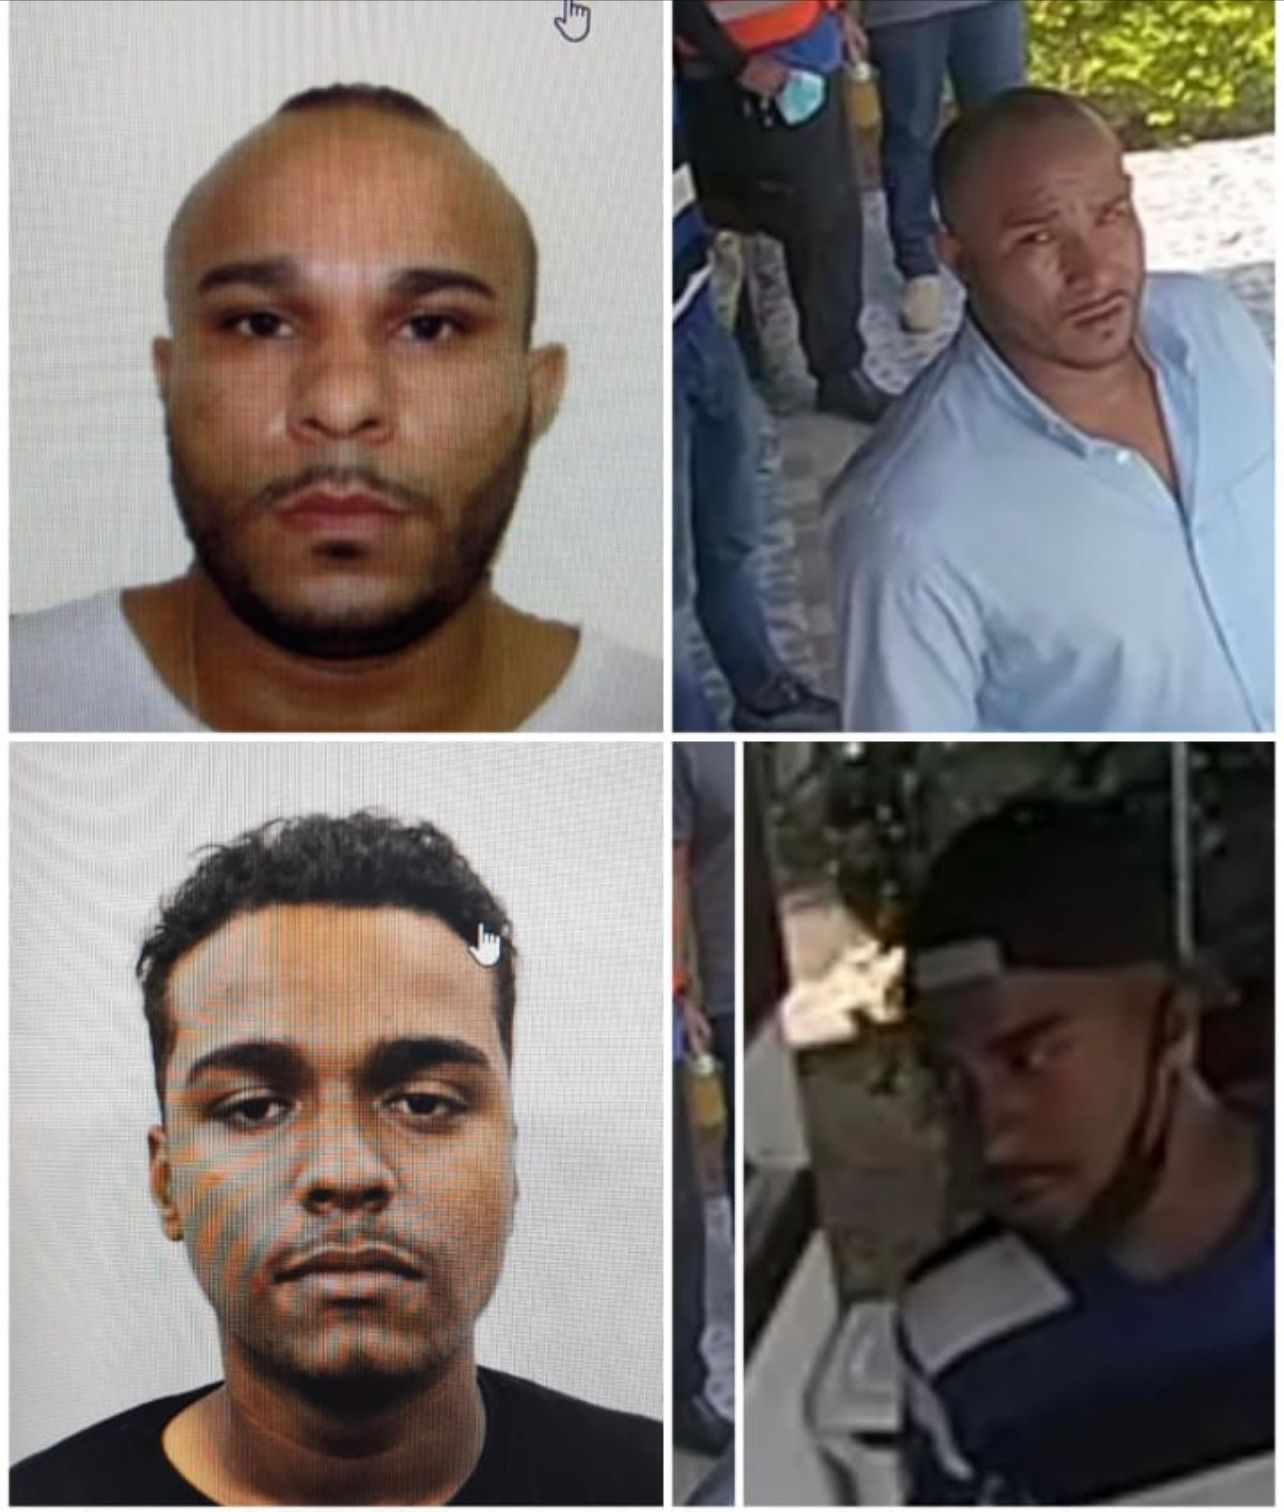 Imagem dos sequestradores do helicóptero